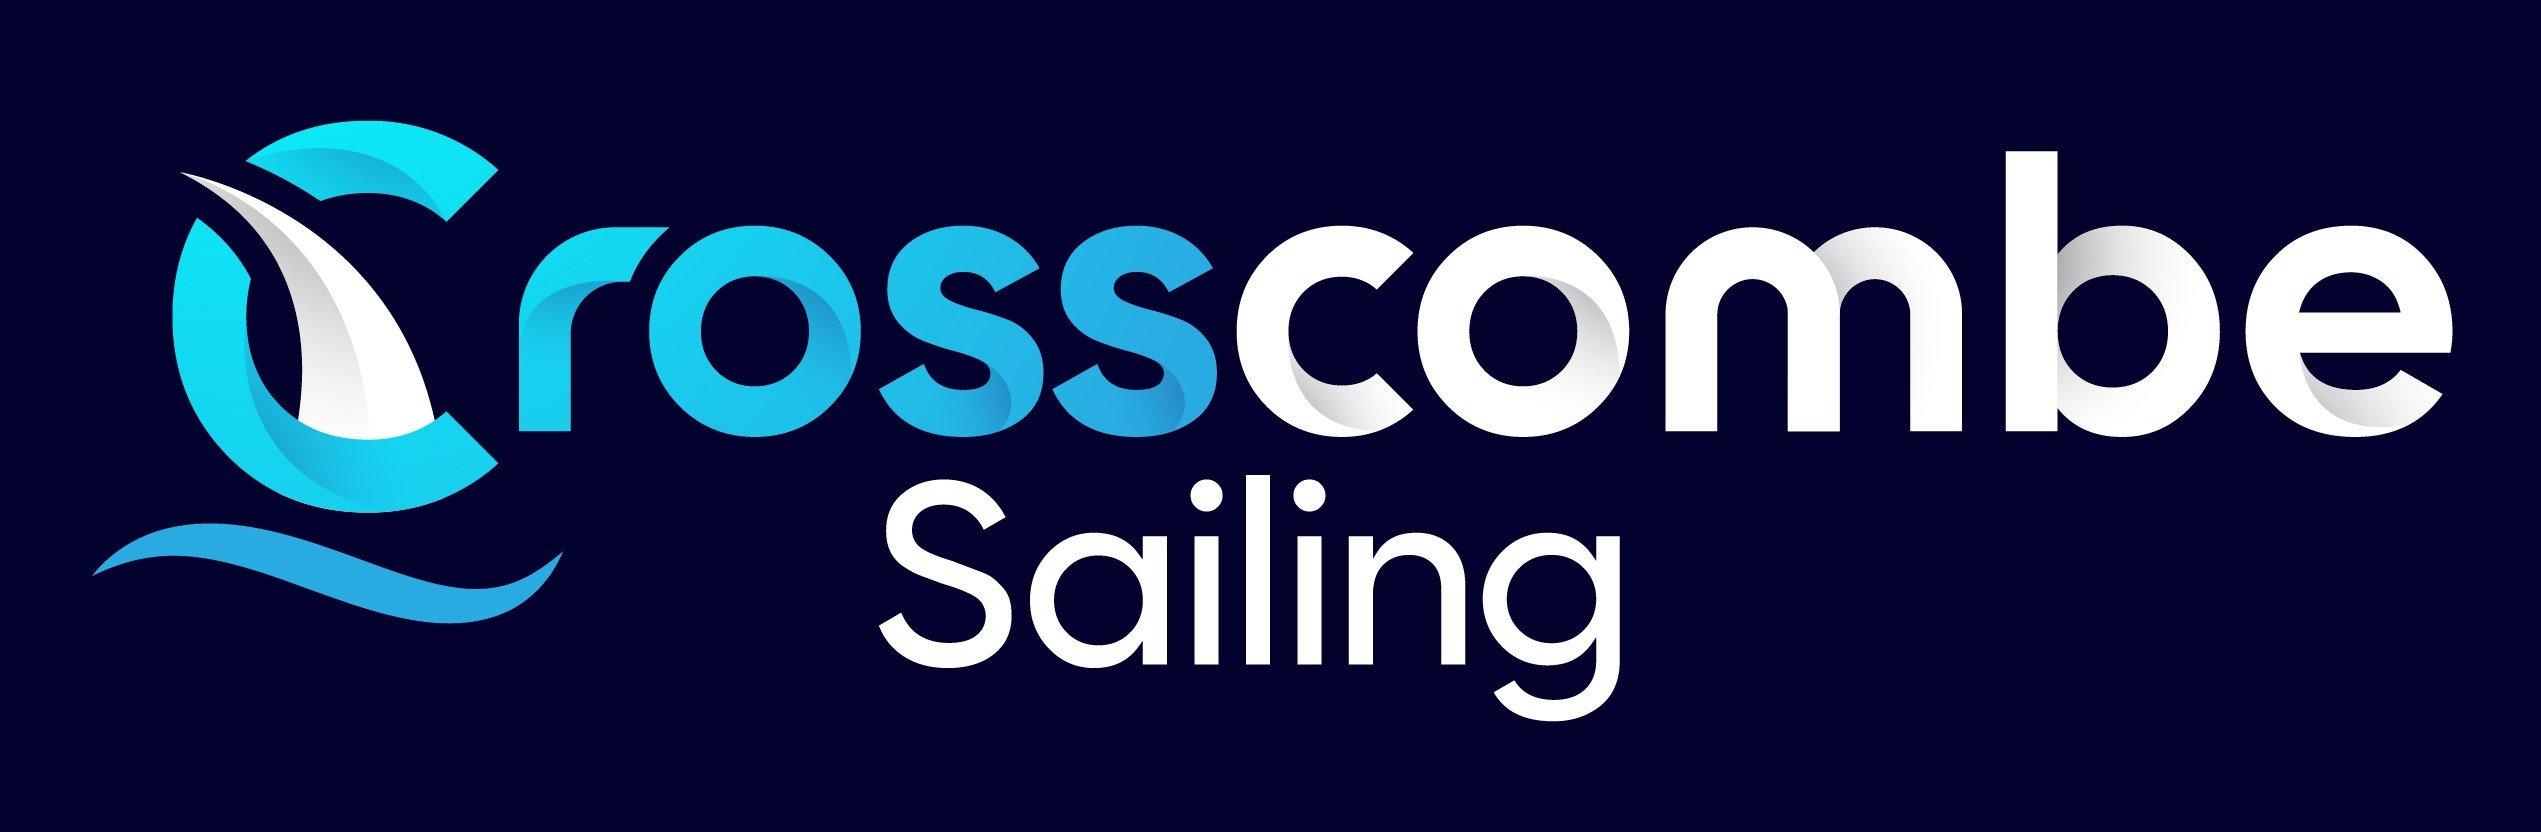 CrosscombeSailing